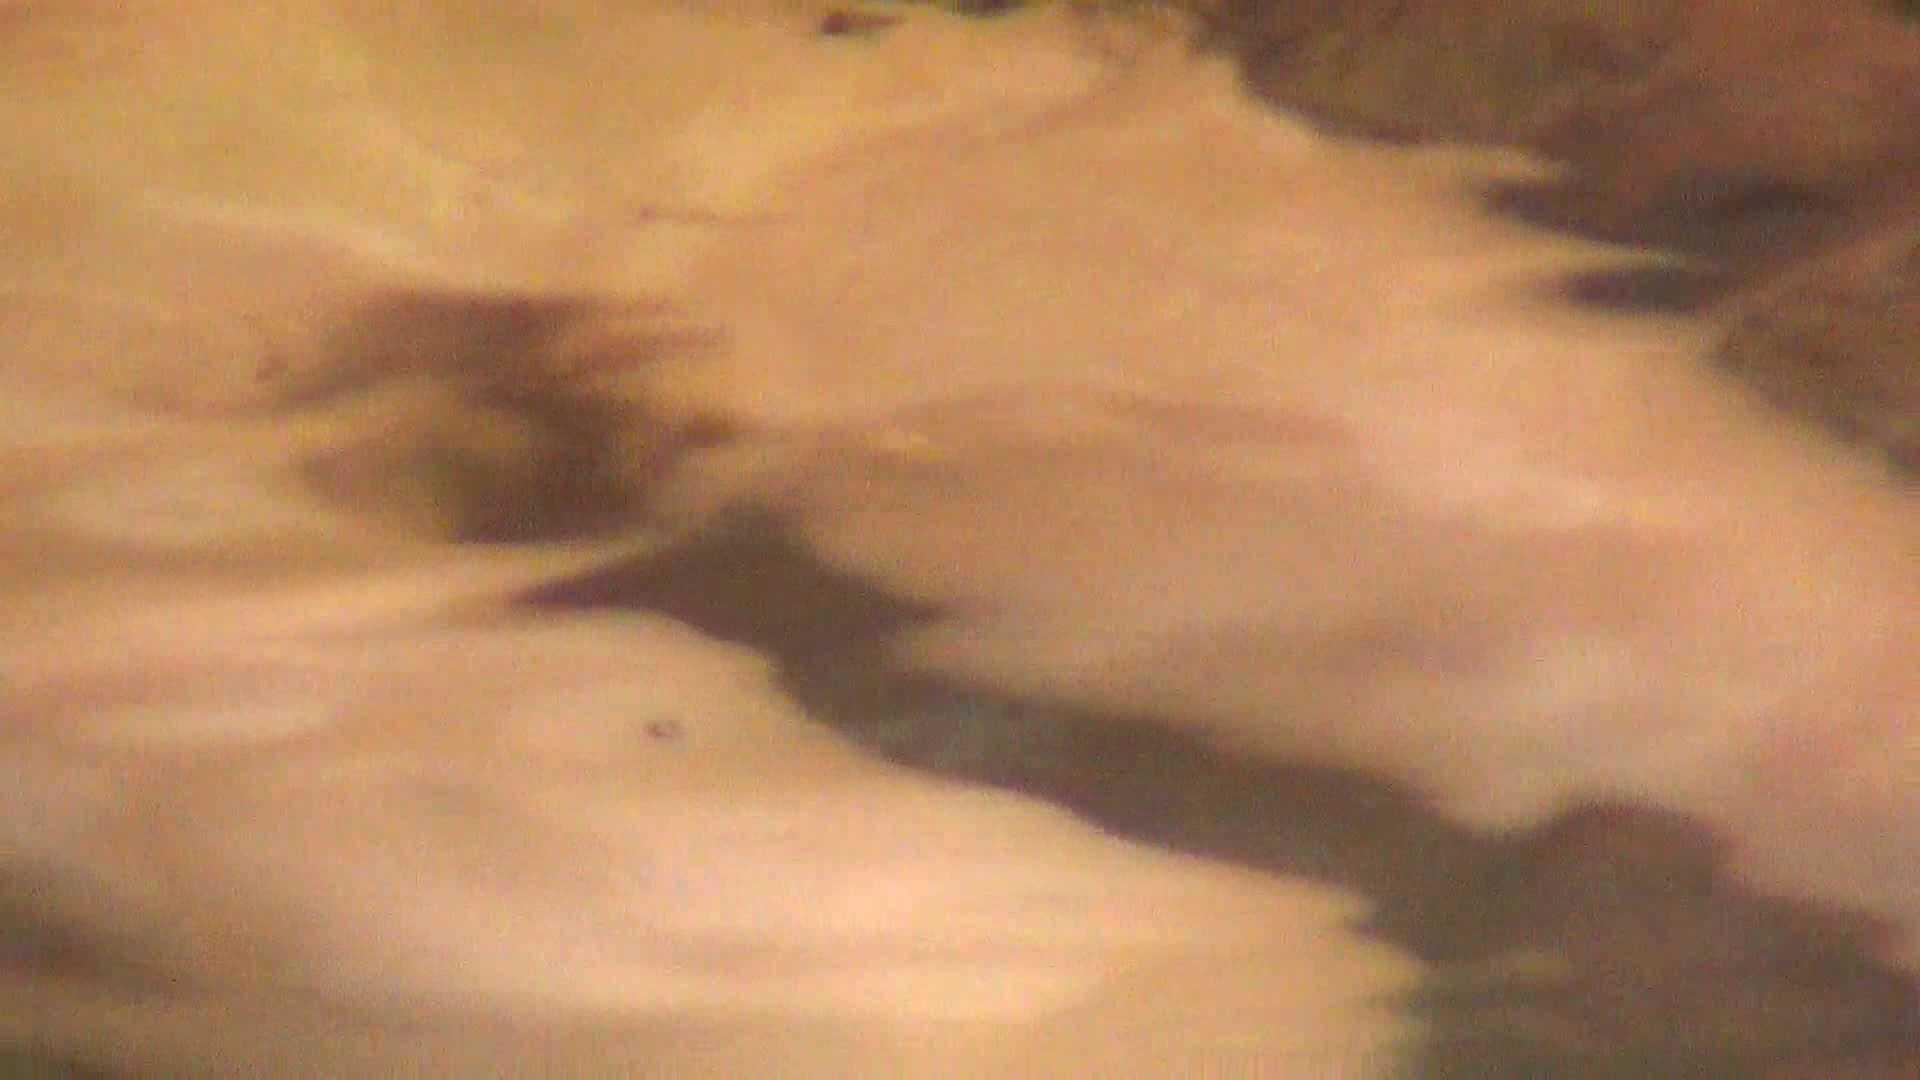 Vol.47 oyakoで登場 スレンダーだけどしっかりしたオッパイ 細身  64PIX 49